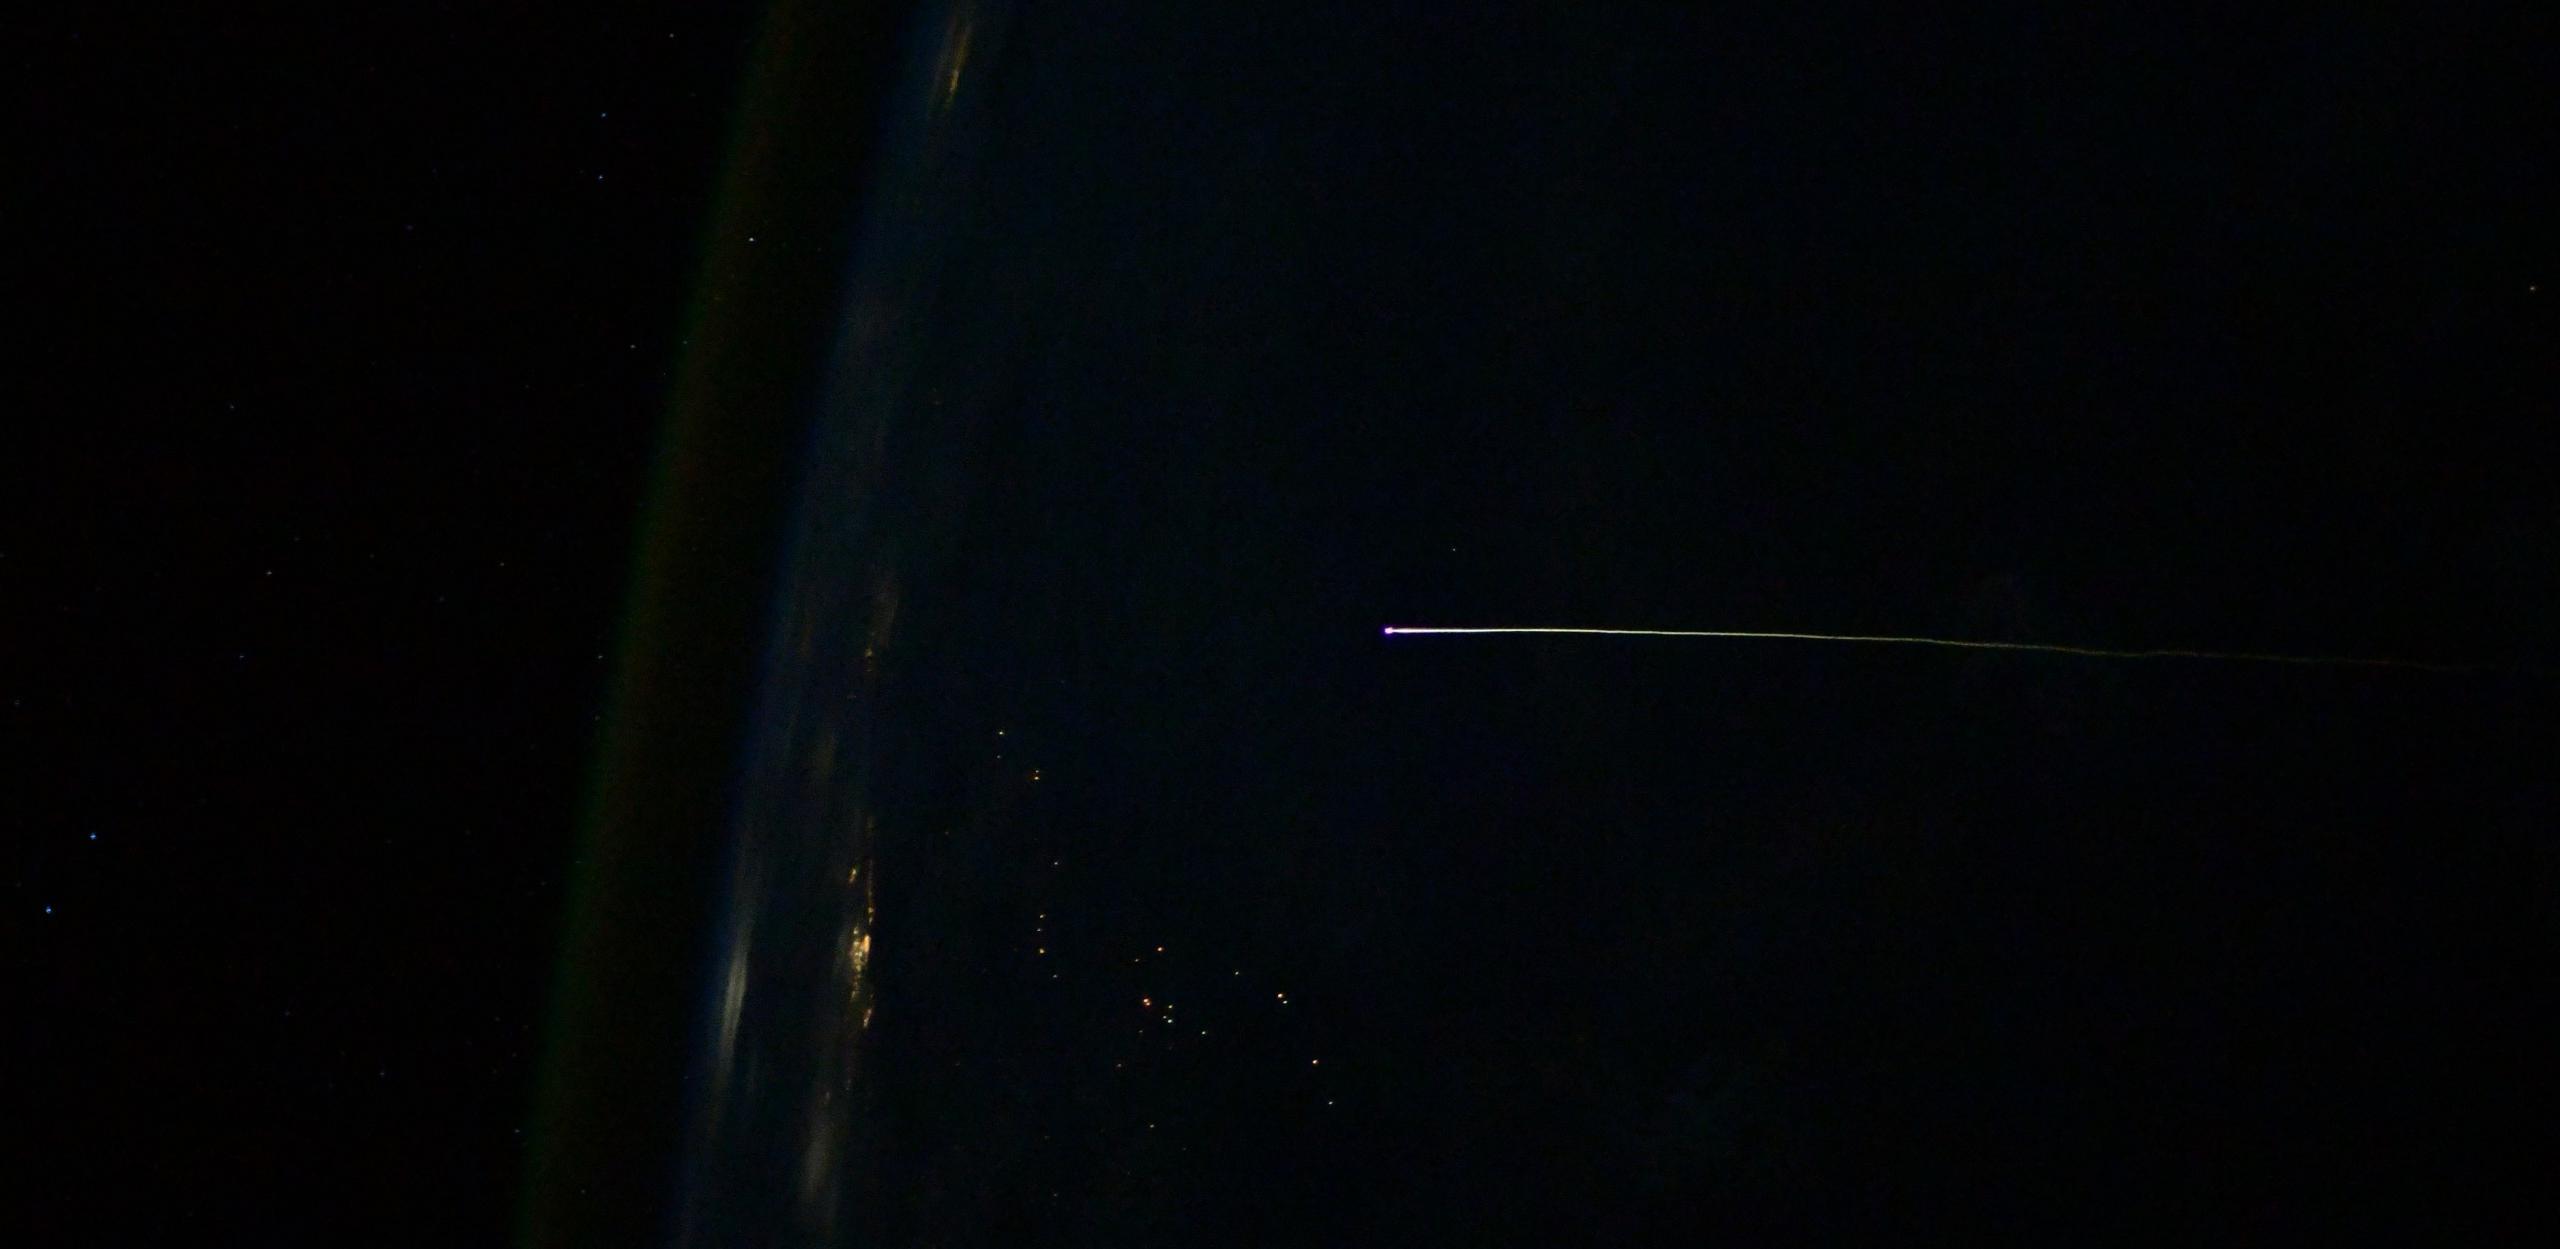 Crew Dragon C207 Crew-1 reentry 050221 (Thomas Pesquet – ESA) 2 crop (c)